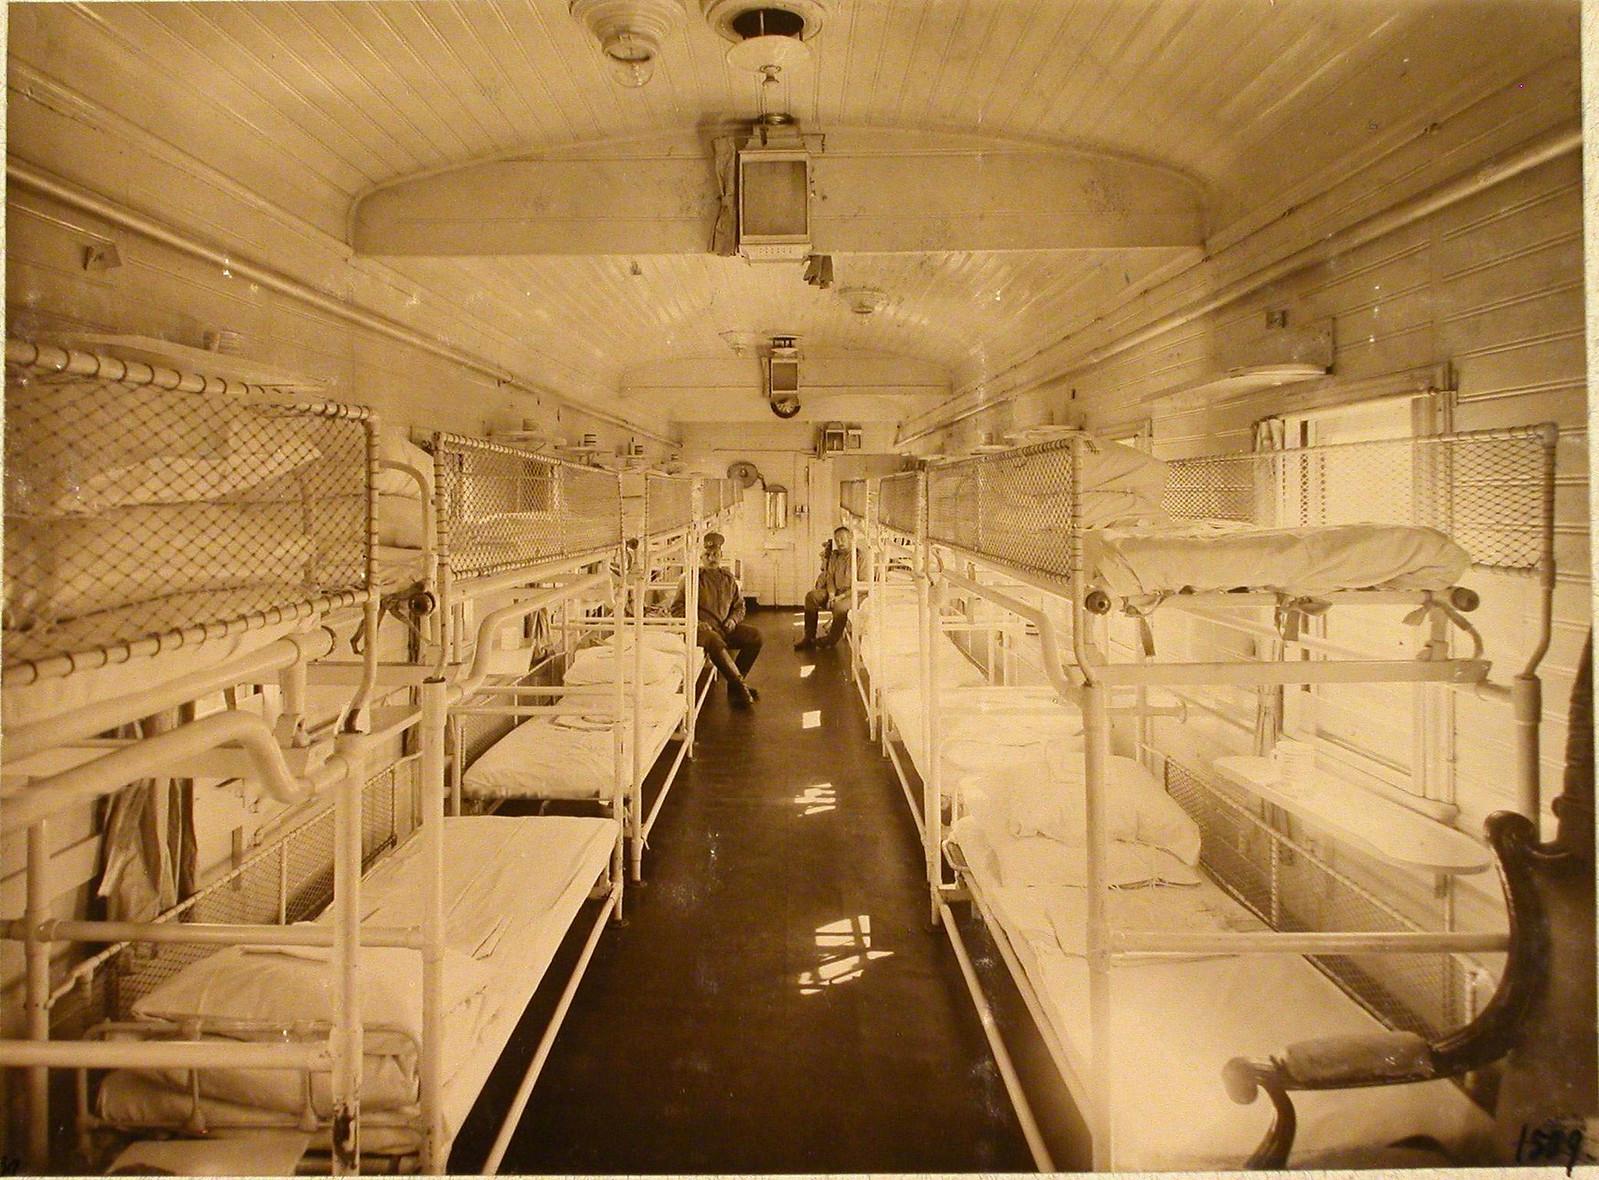 Внутренний вид вагона, оборудованного для перевозки тяжелораненых